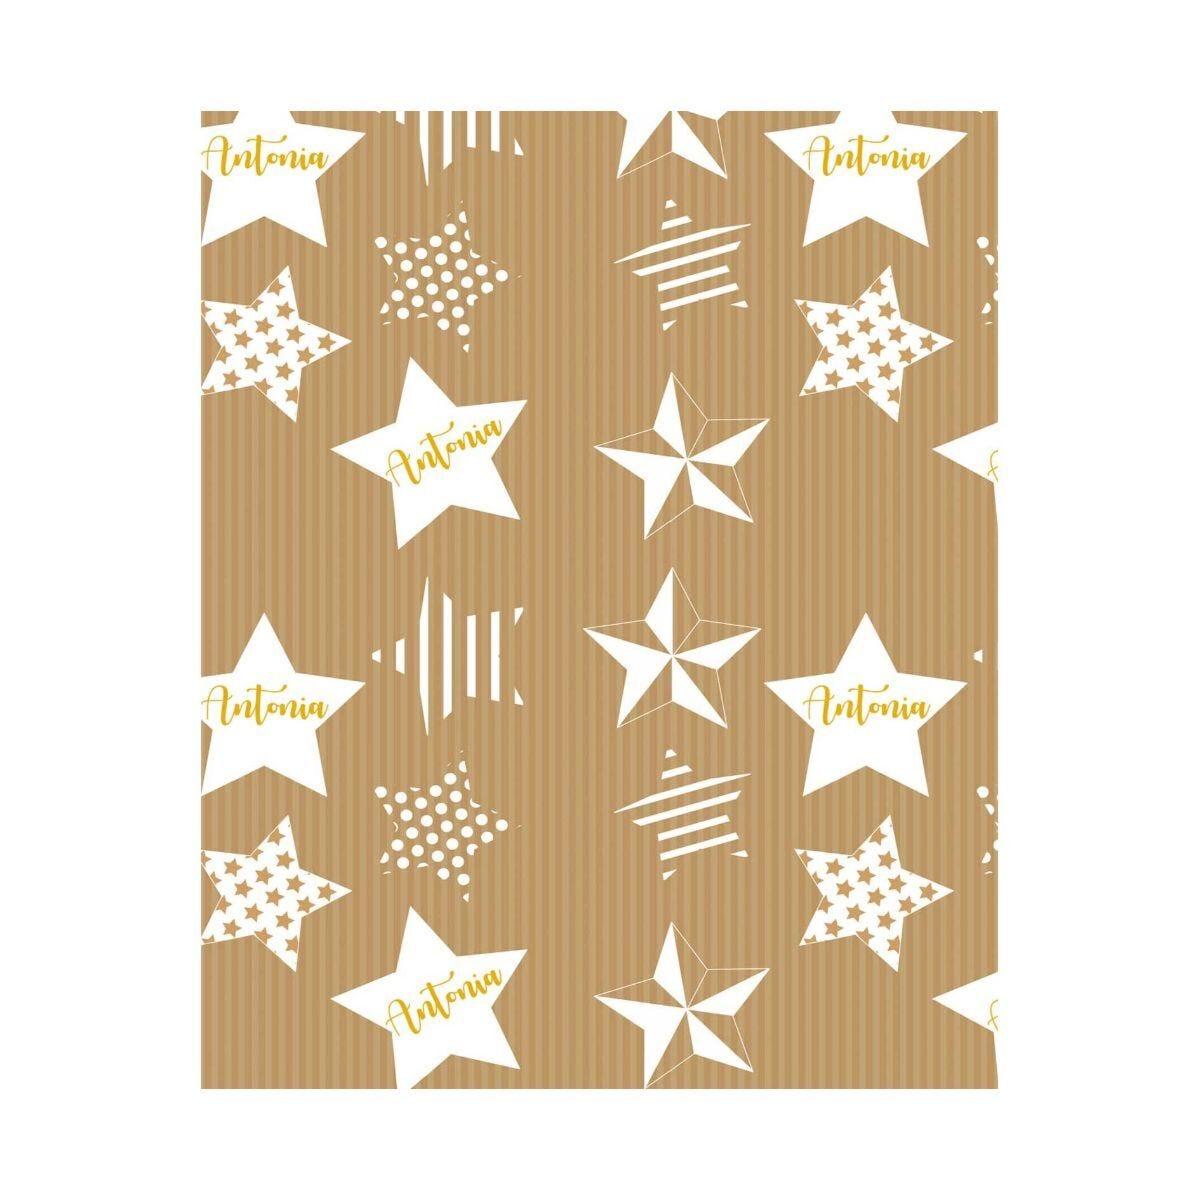 Ryman Personalised Wrapping Paper Stars 1 Metre x 1 Metre